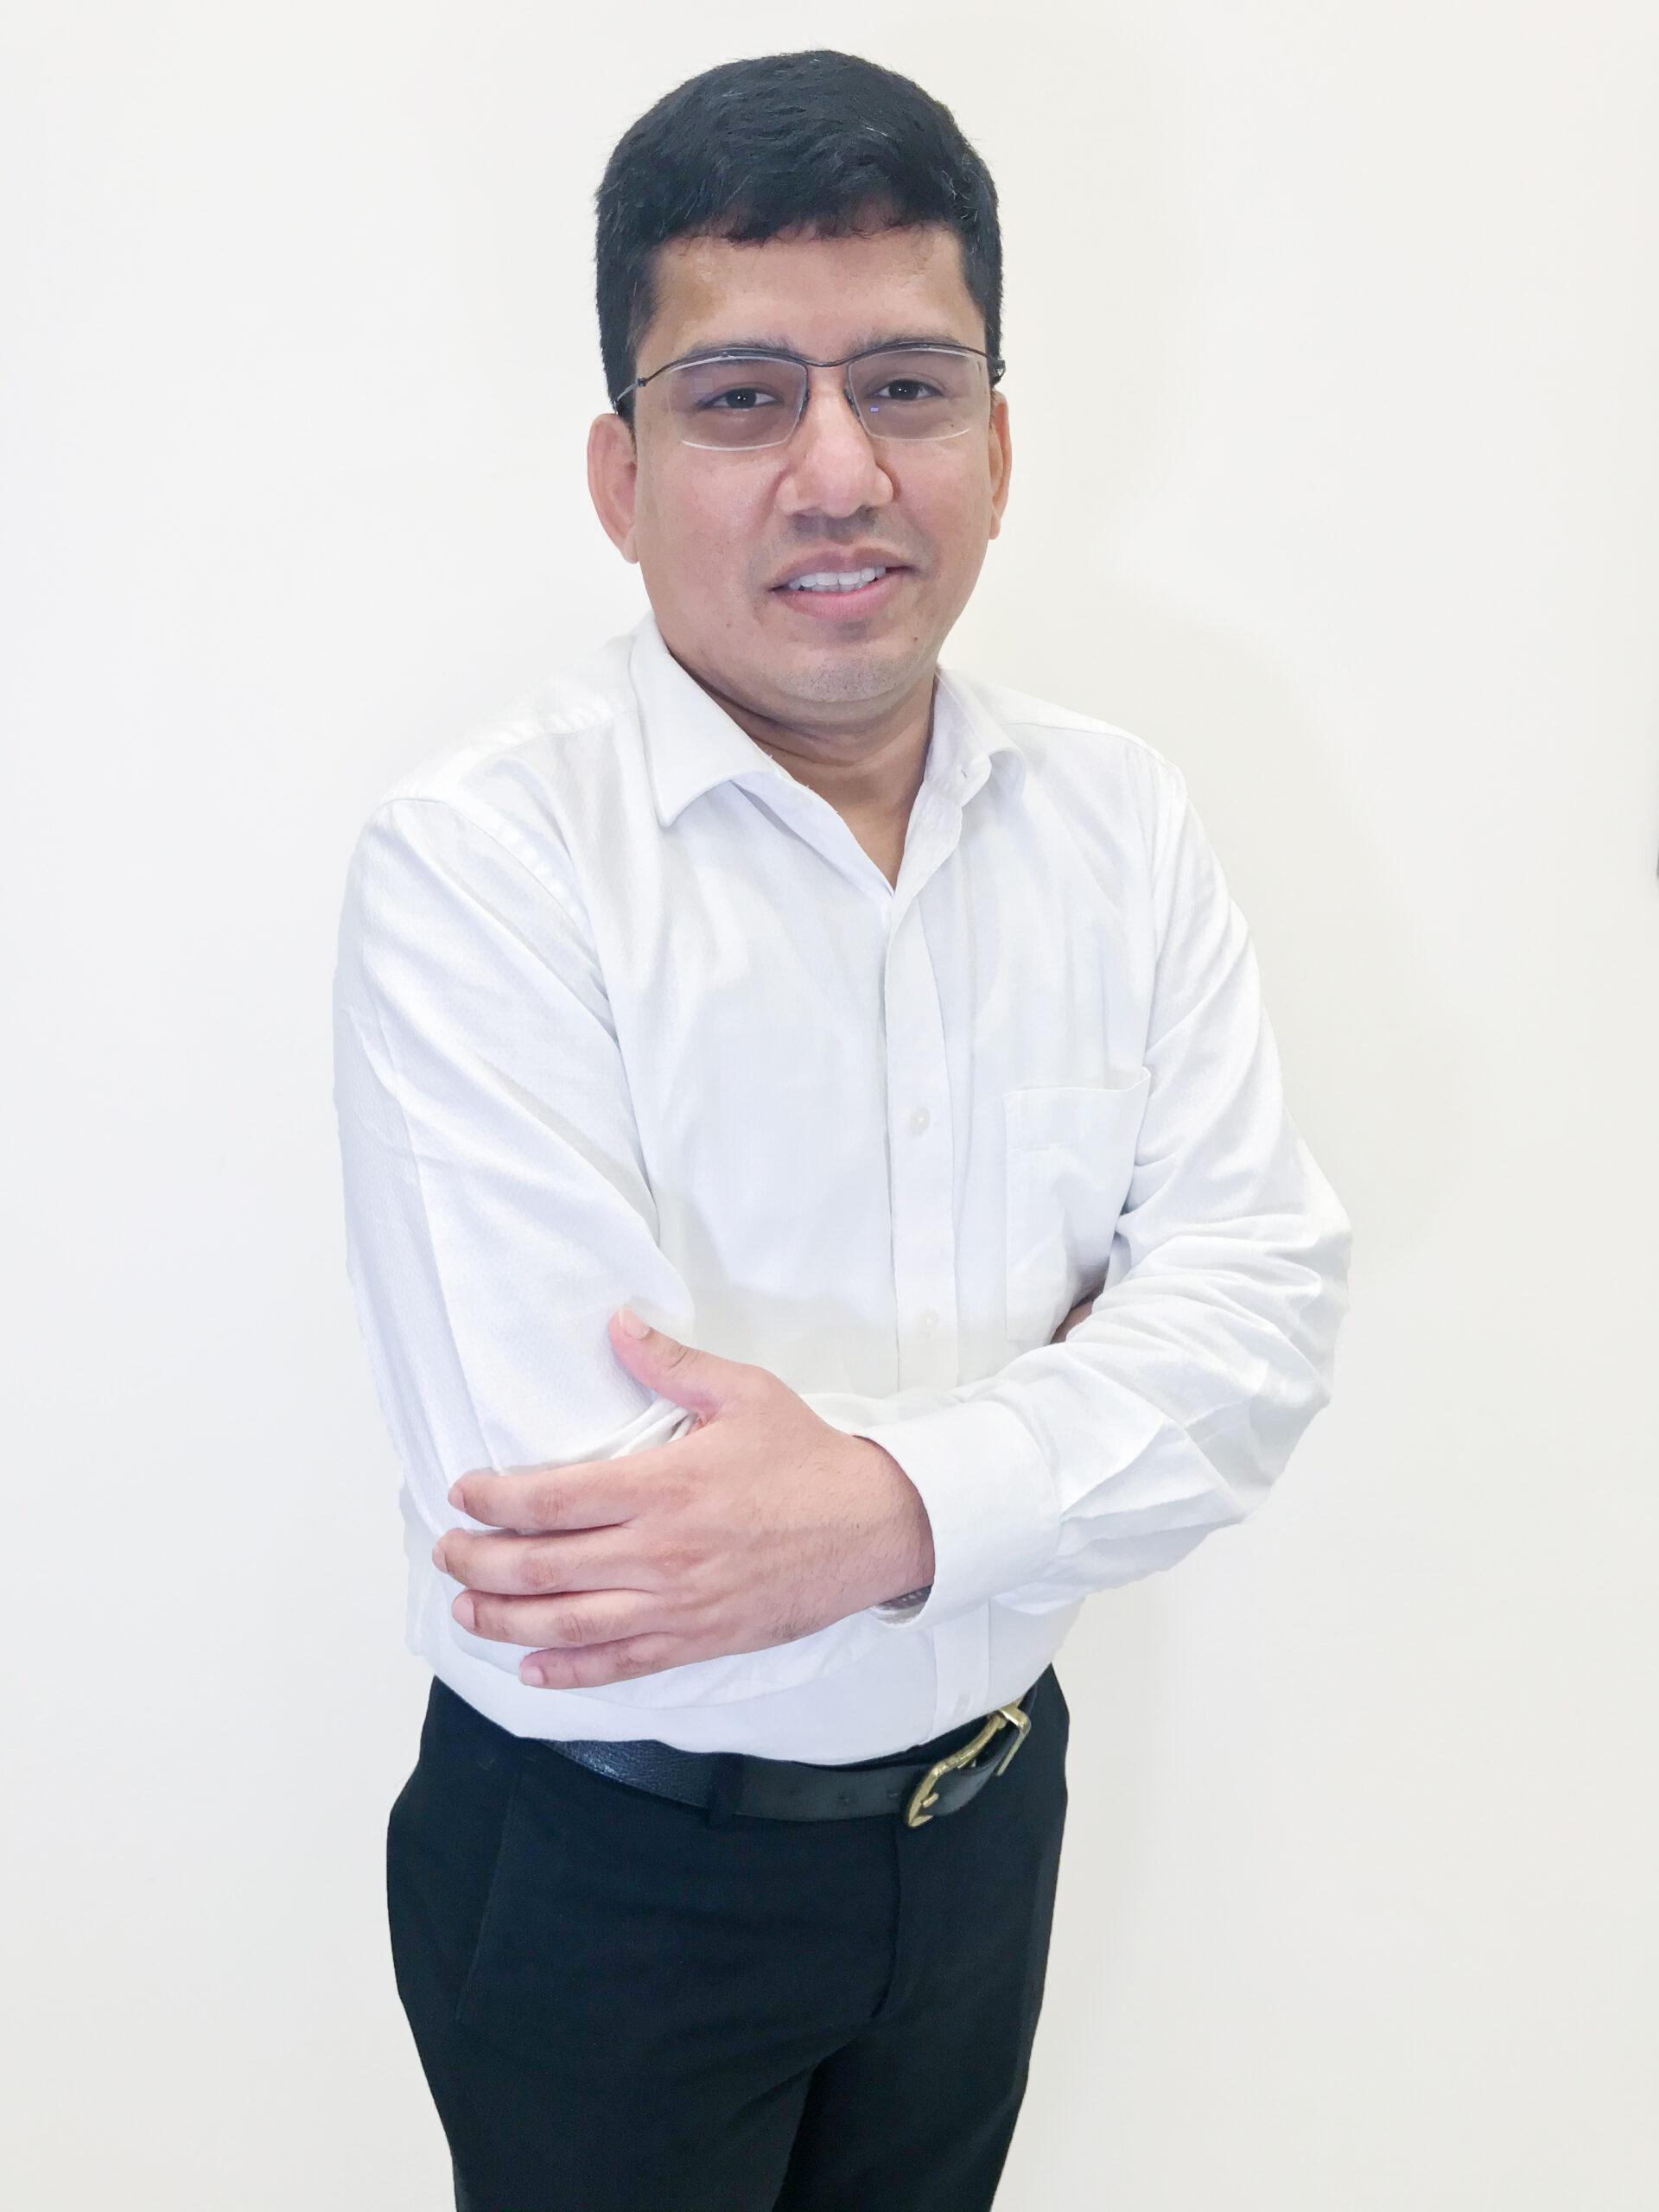 Frank Jonathan - Combined Council Chairman 2021